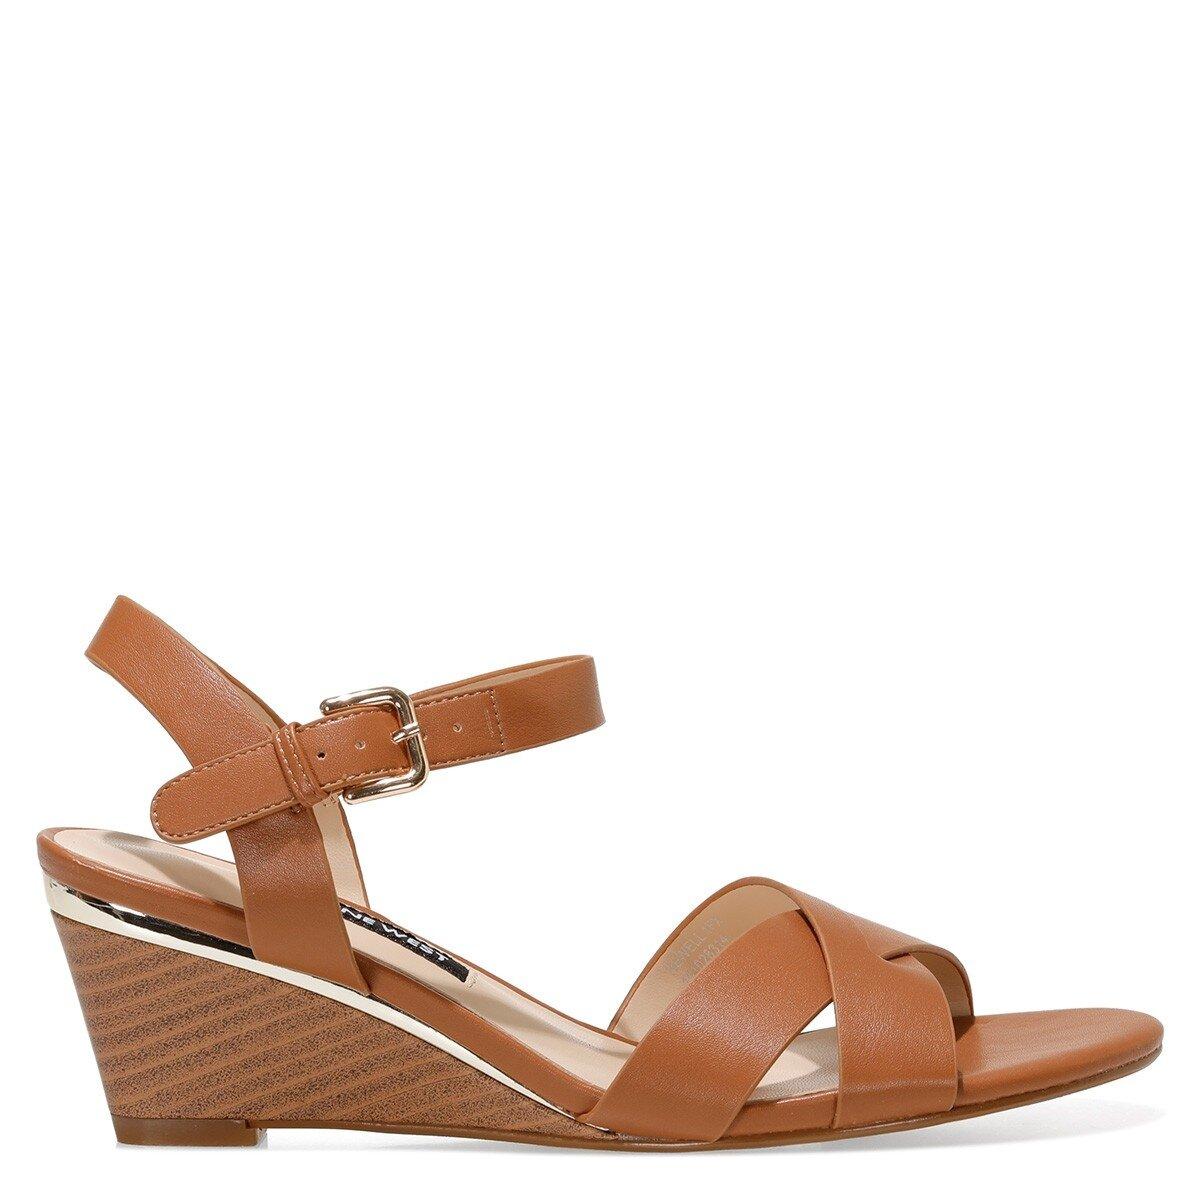 HEWELL 1FX Taba Kadın Dolgu Topuklu Sandalet